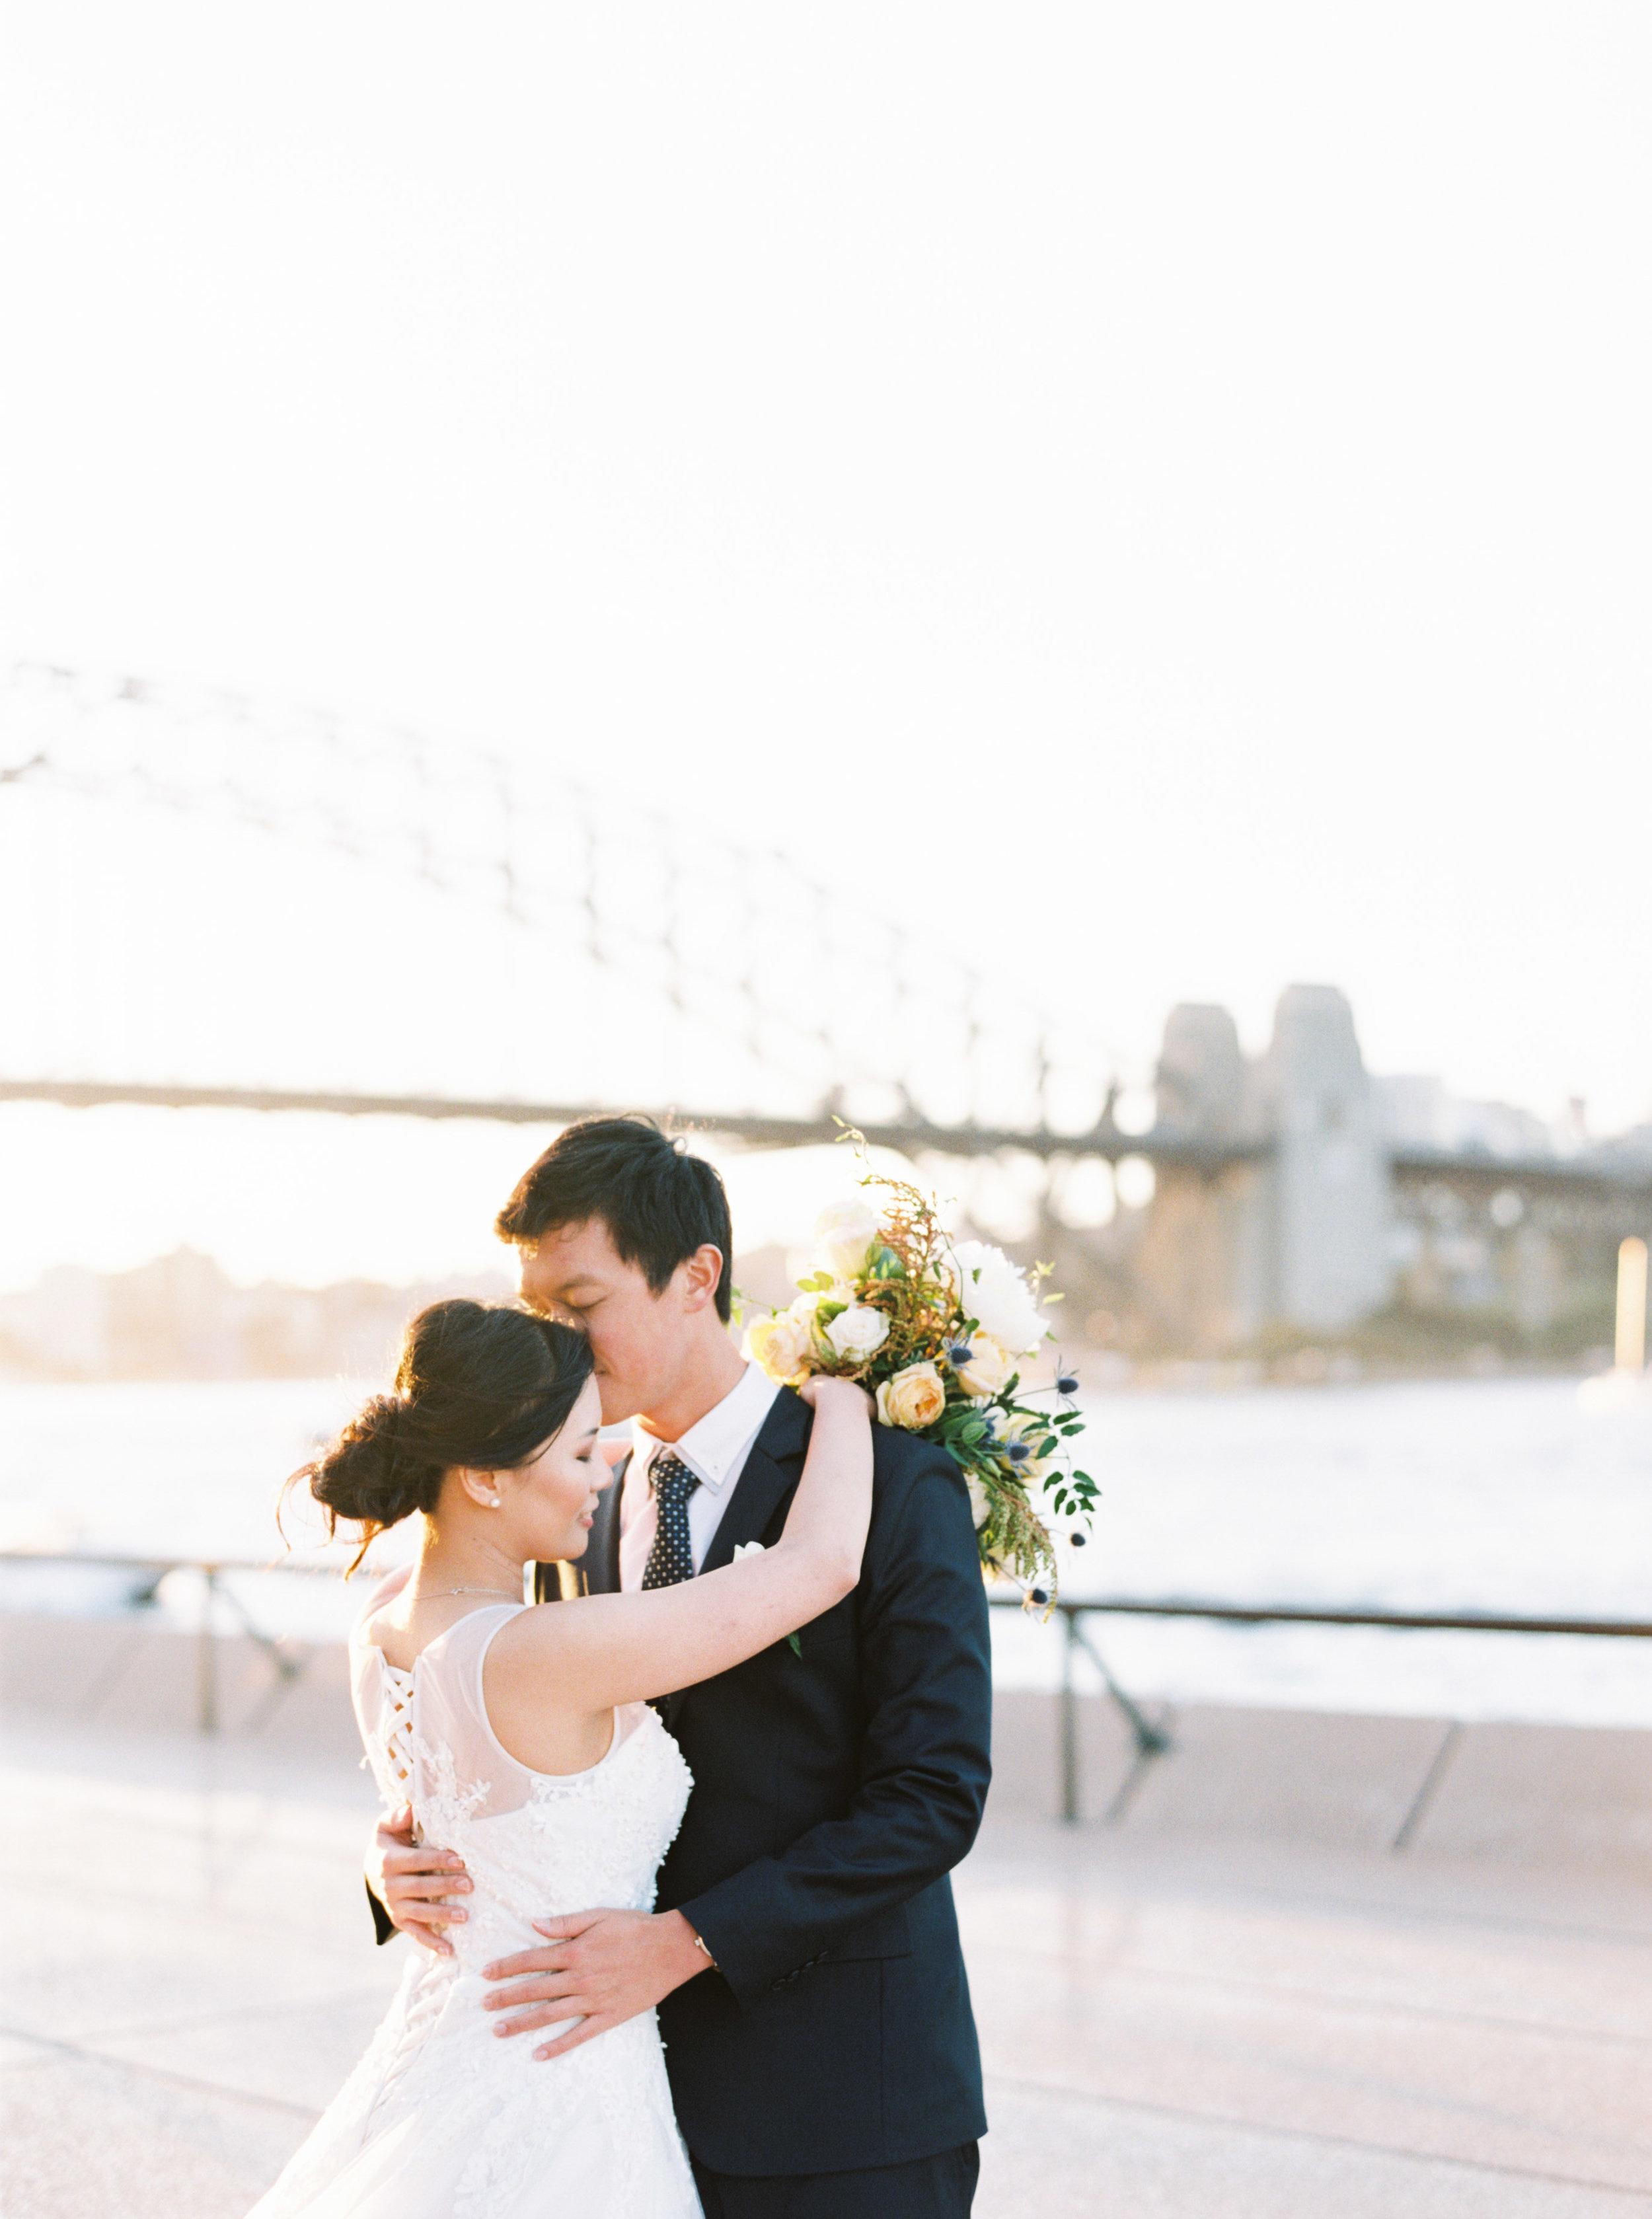 00043- Australia Sydney Wedding Photographer Sheri McMahon.jpg